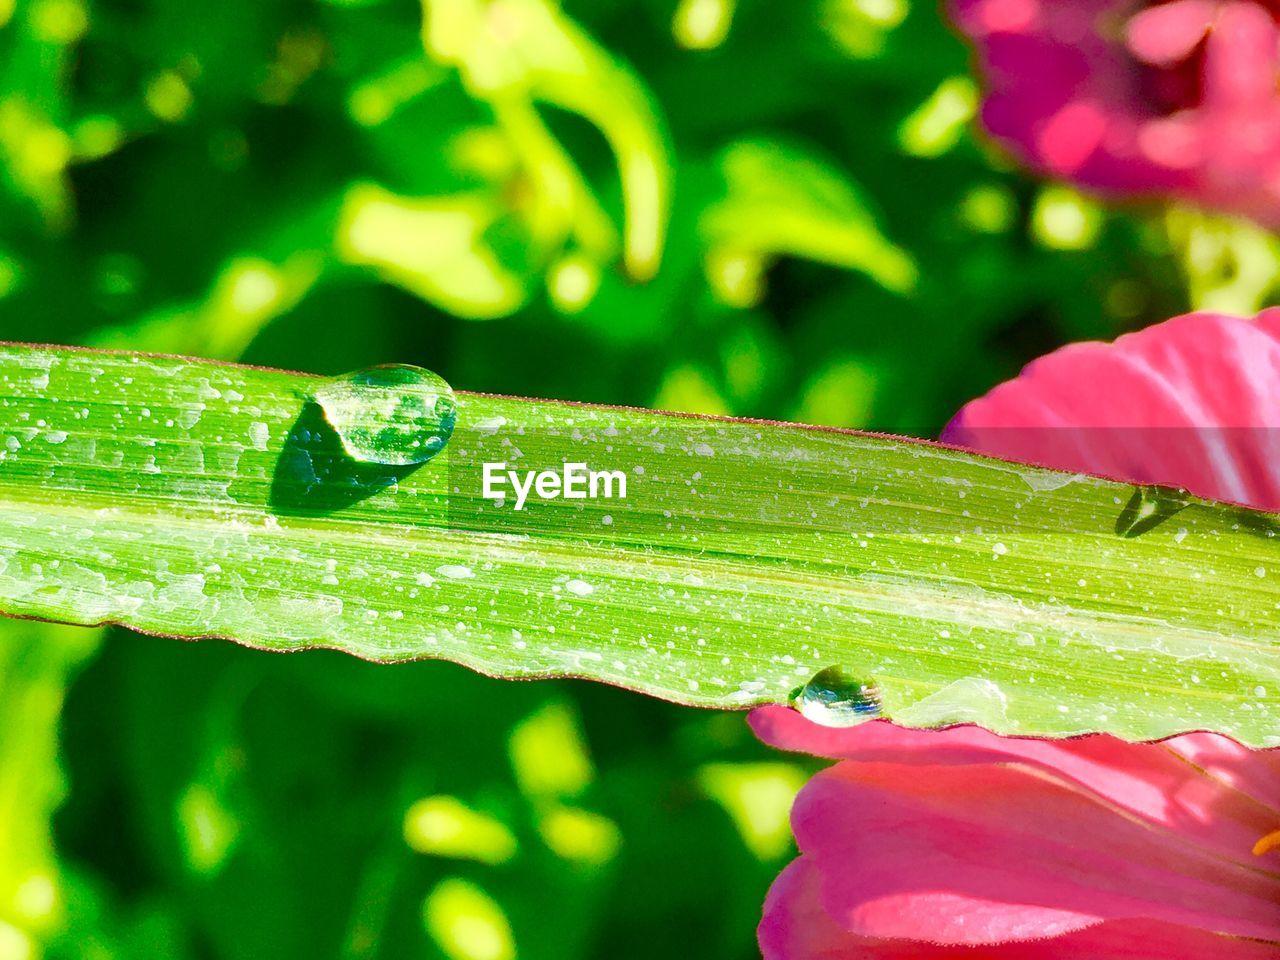 Close-Up Of Wet Leaf On Plant